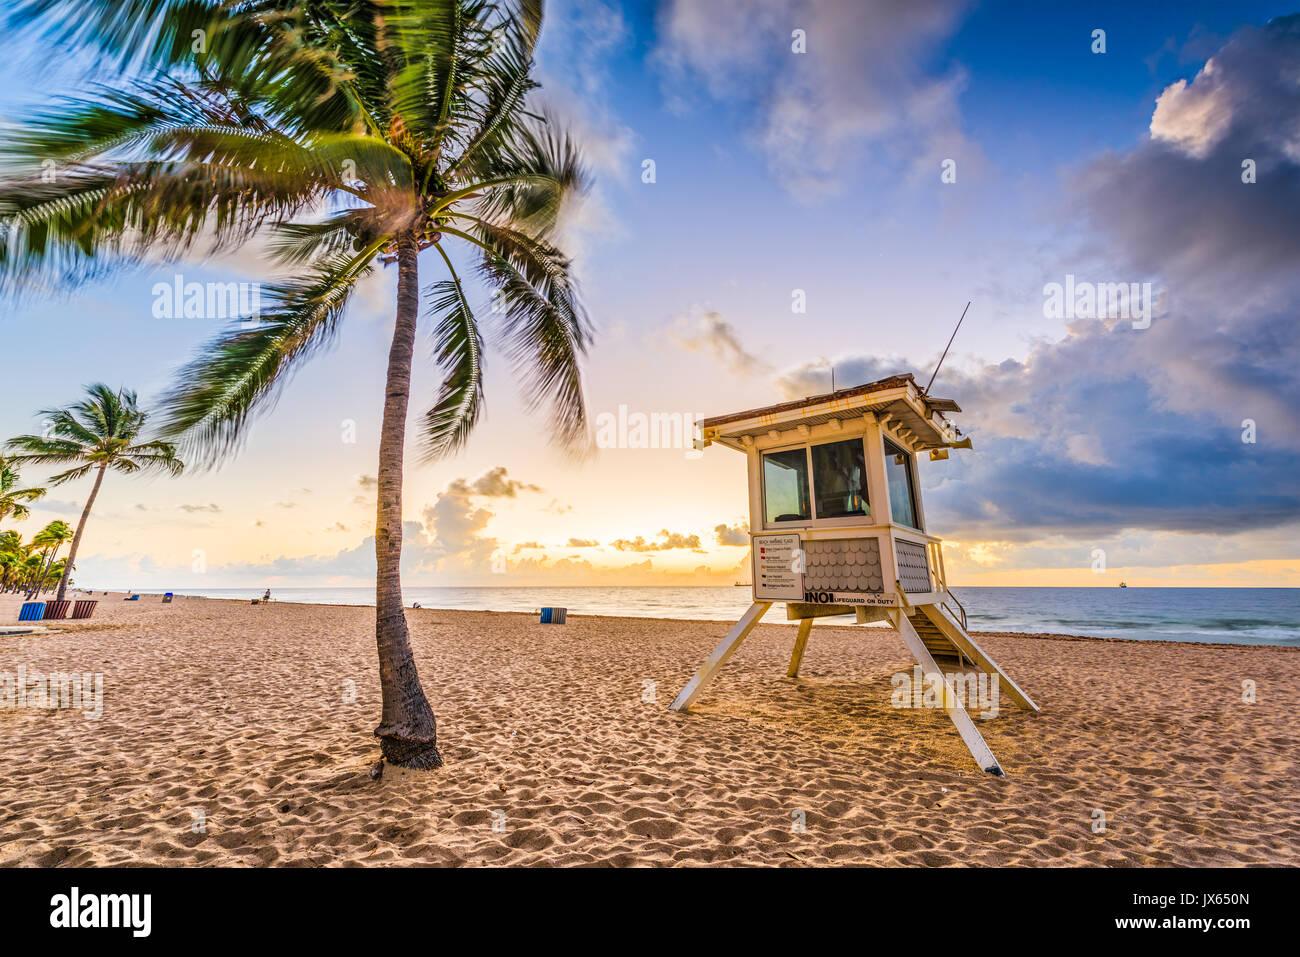 Spiaggia di Fort Lauderdale, Florida, Stati Uniti d'America. Immagini Stock